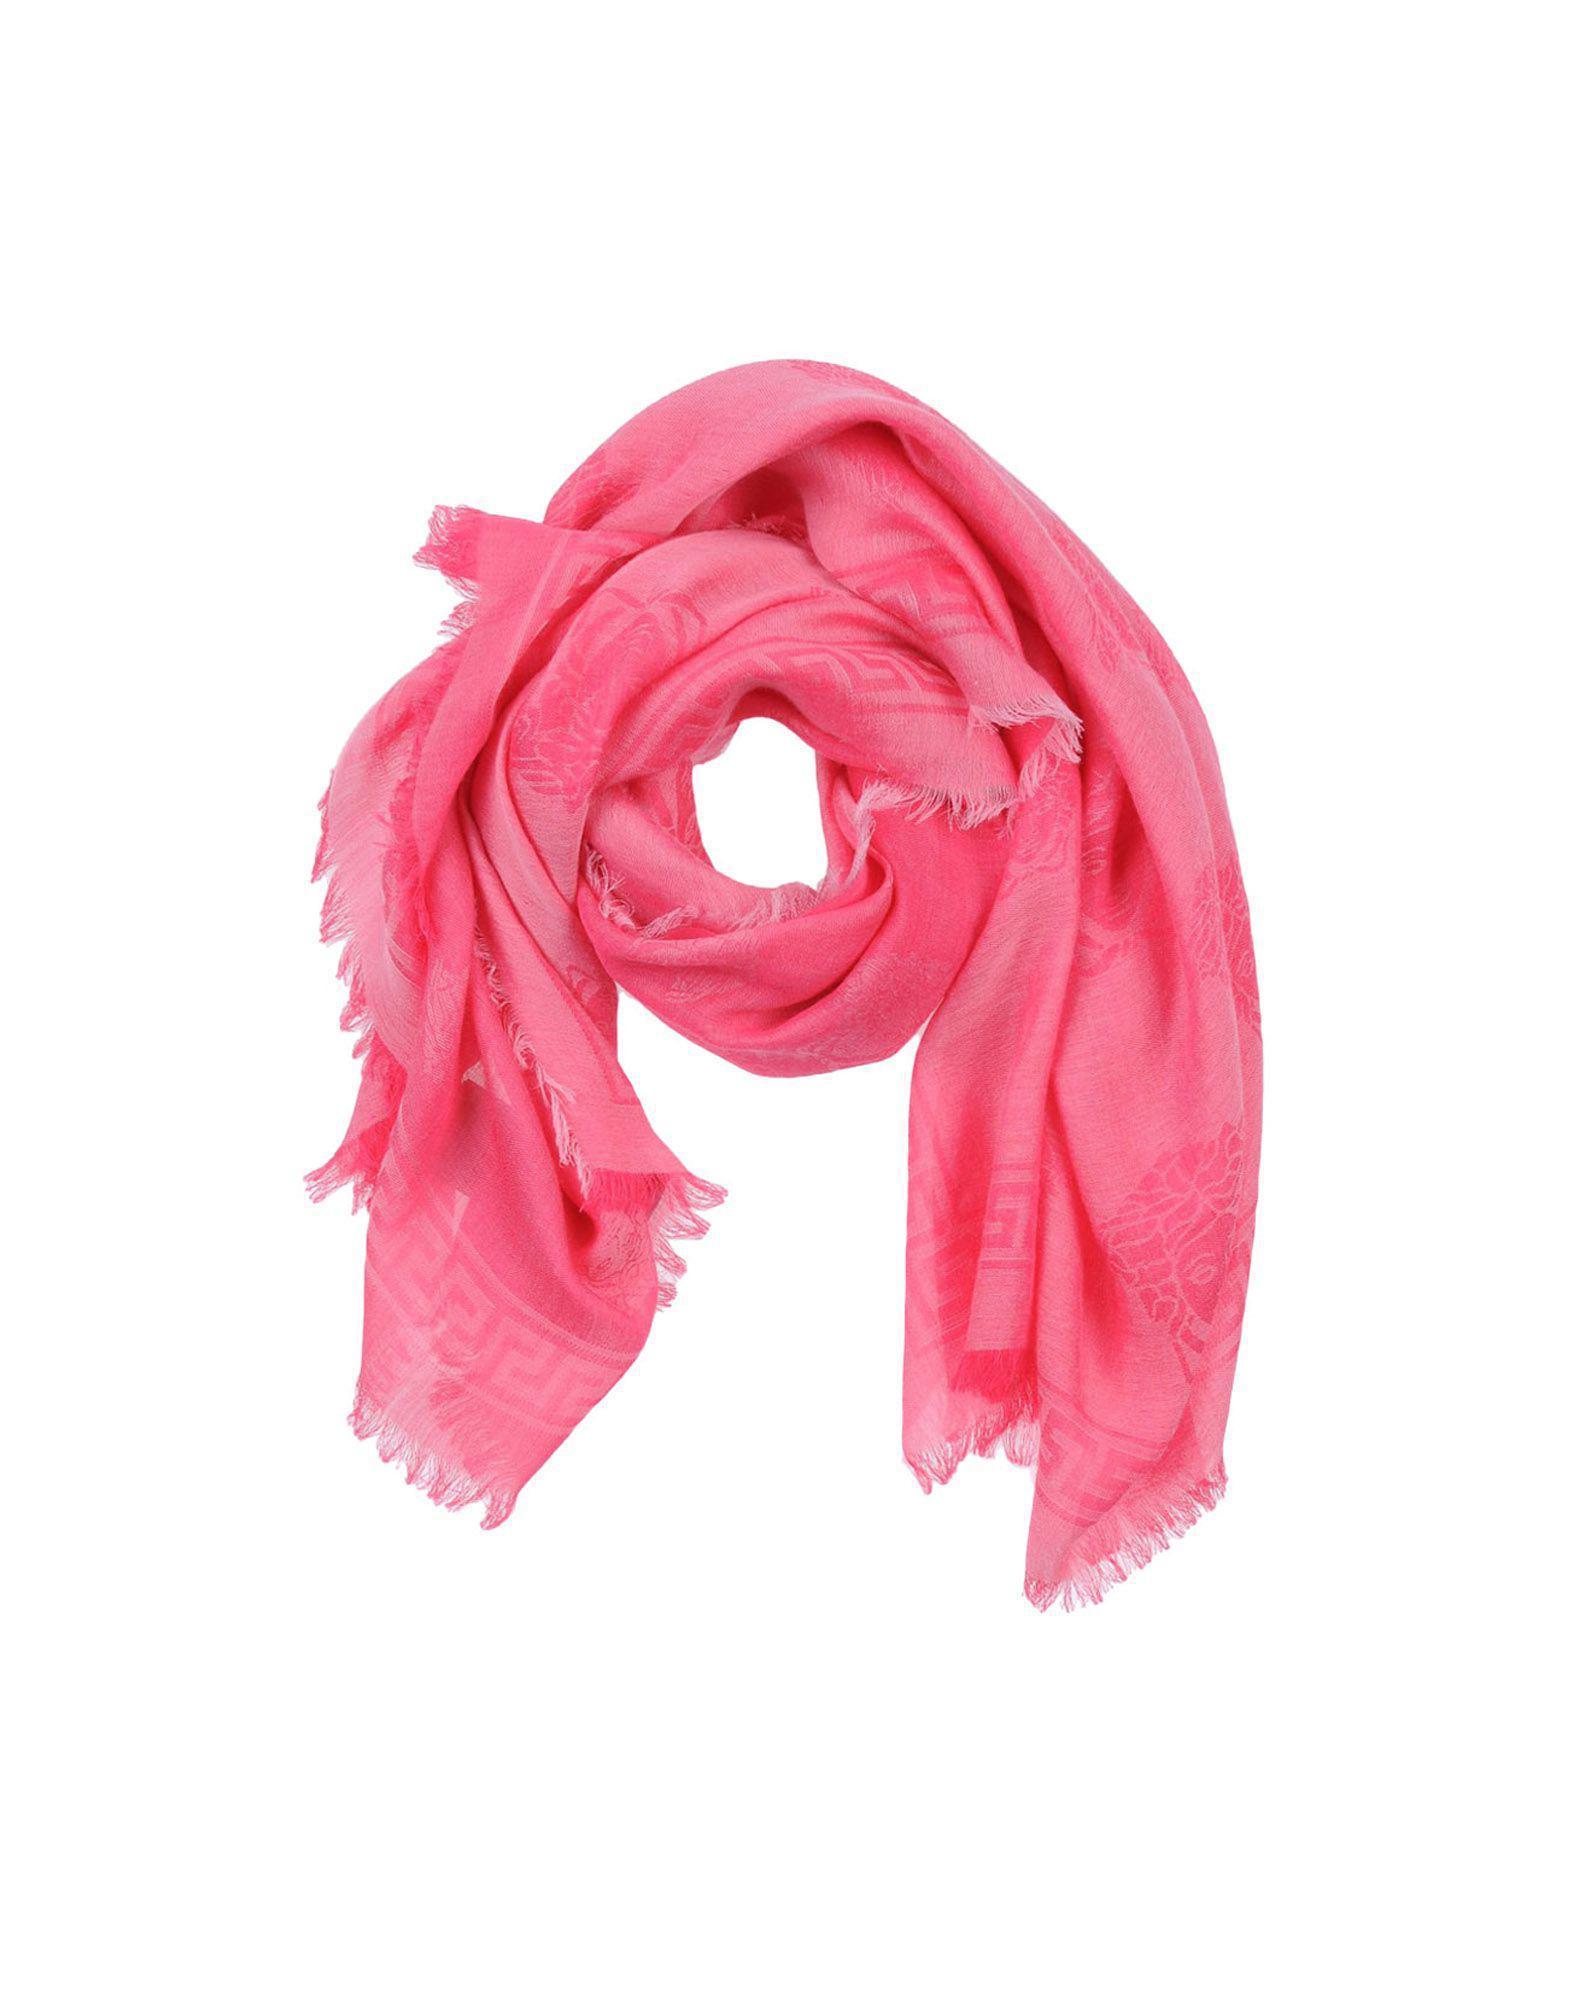 228c23dba86 Lyst - Foulard Versace en coloris Rose